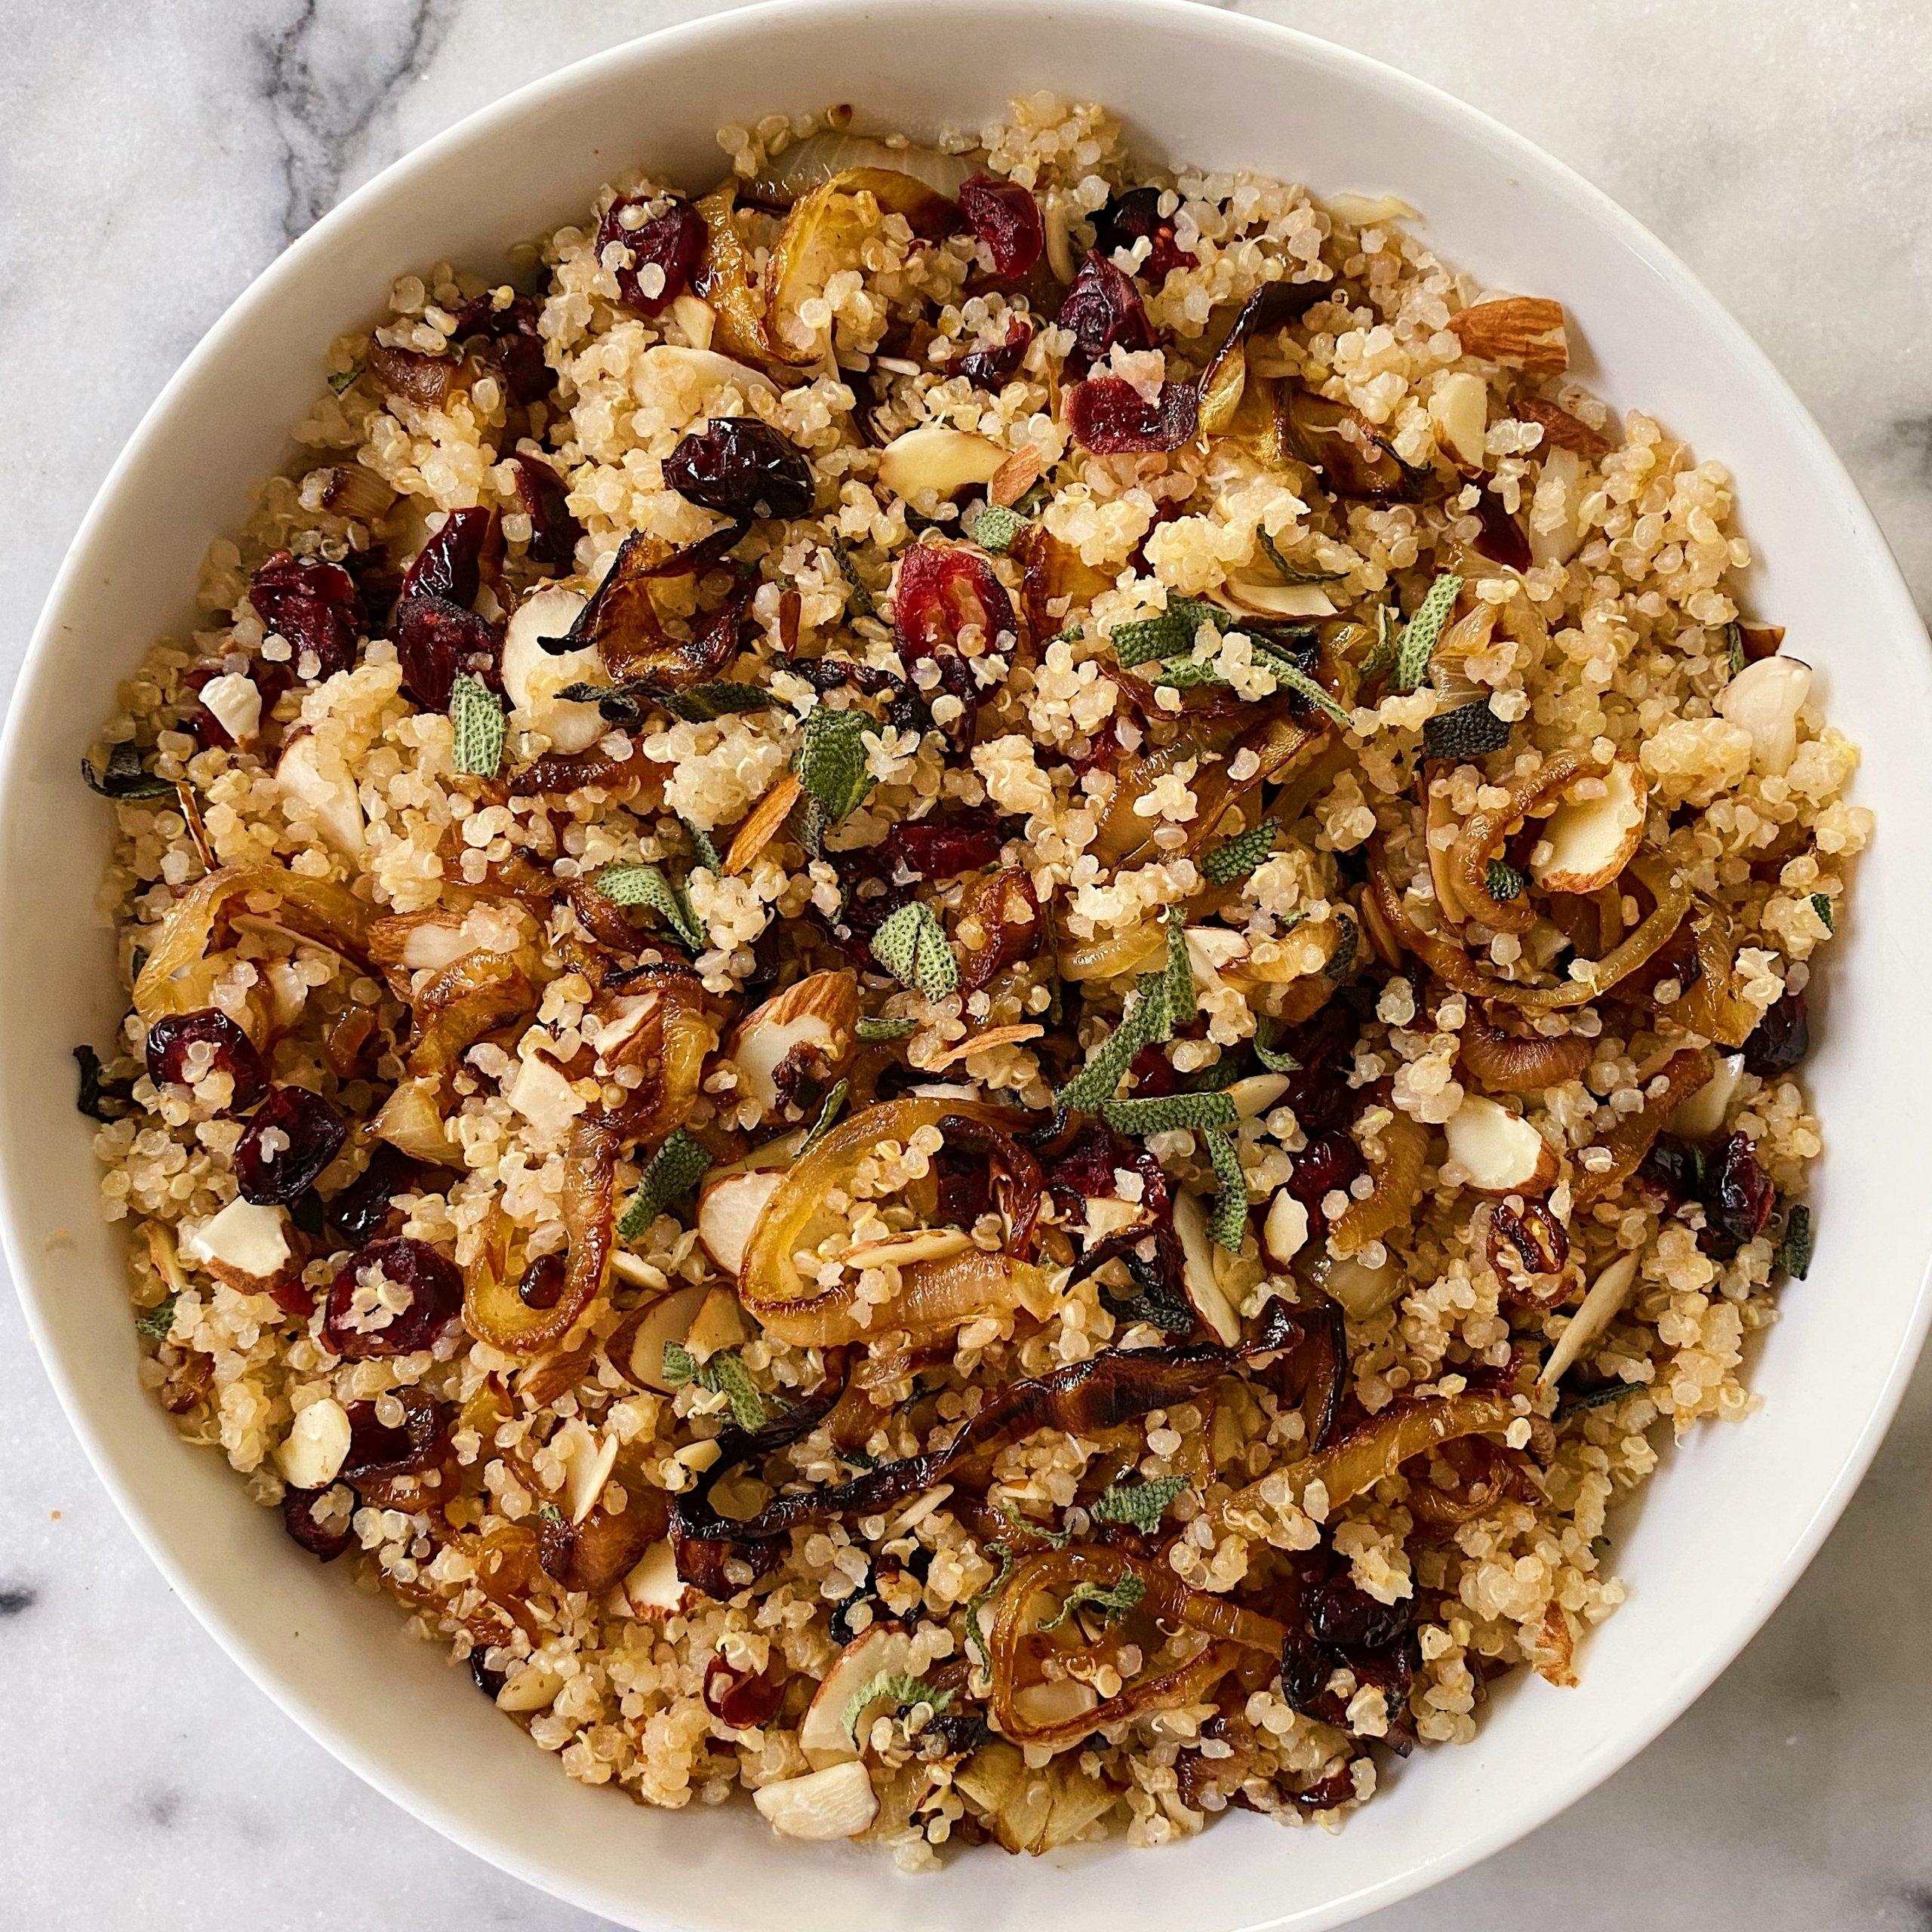 Gluten-Free Fall Quinoa Salad #glutenfree #glutenfreerecipes www.healthygffamily.com